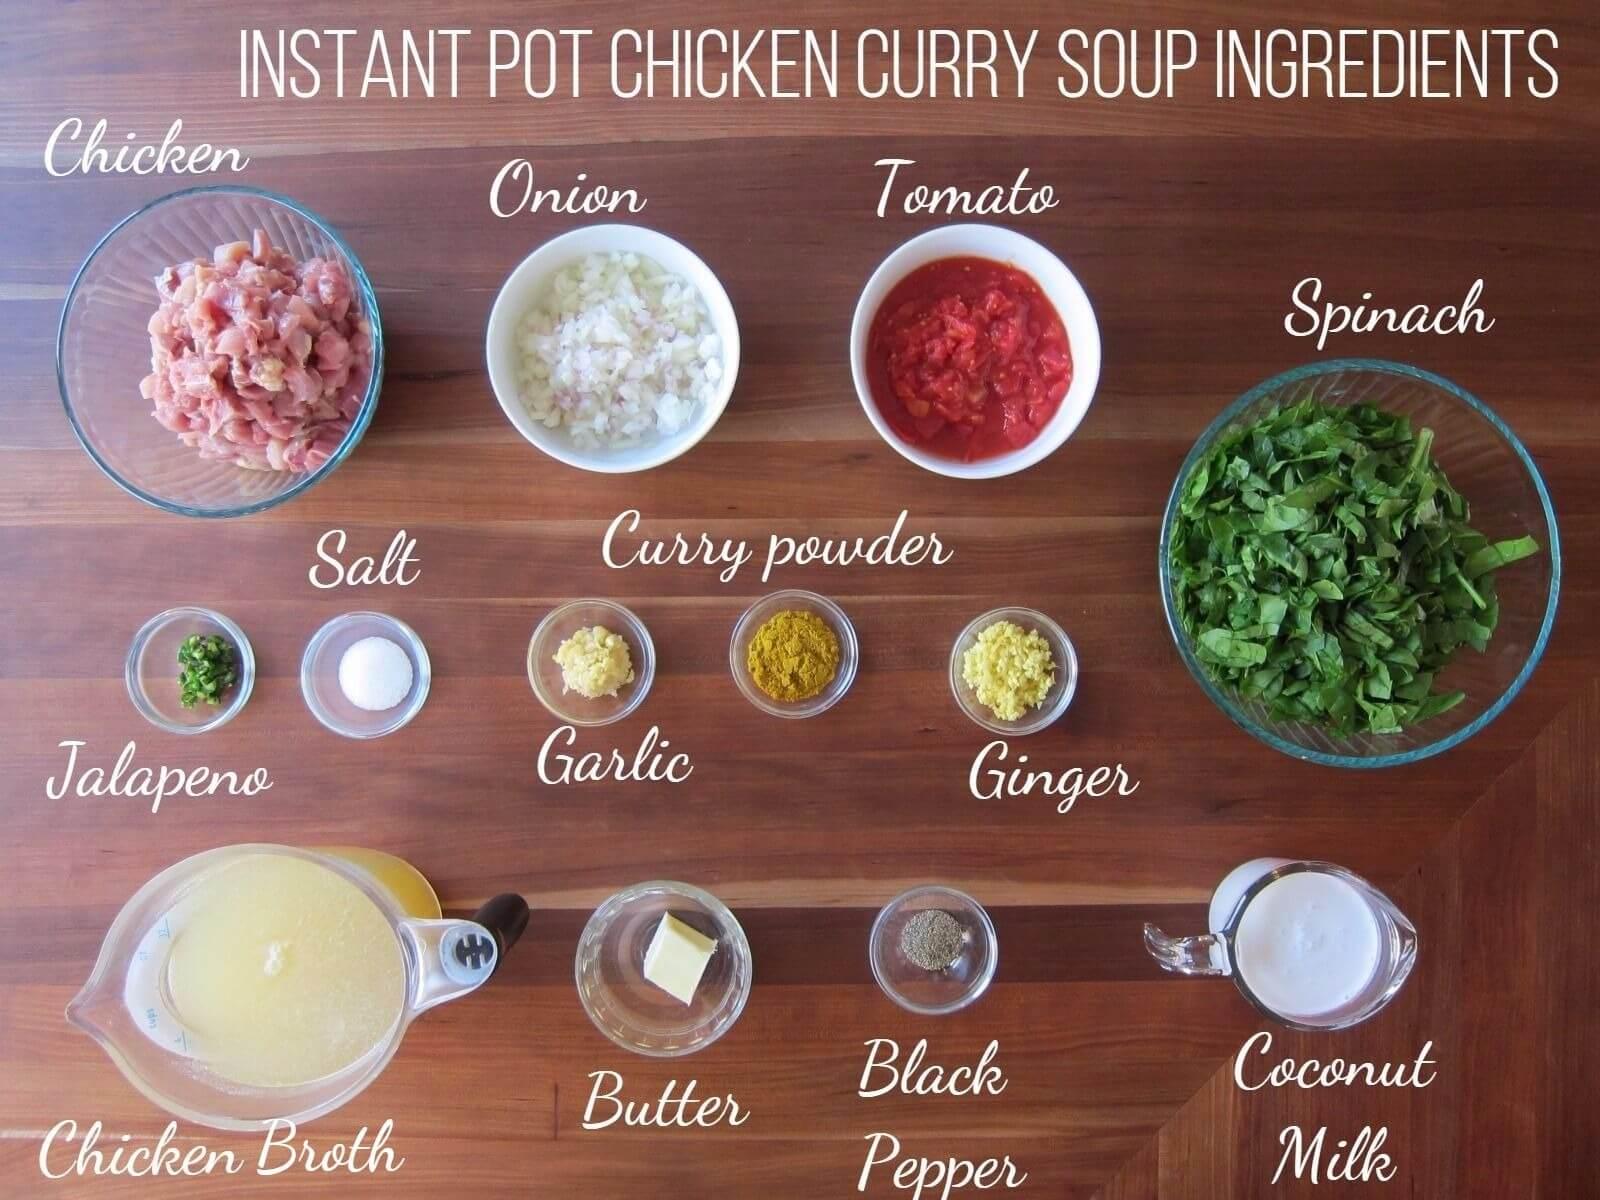 Instant Pot Chicken Curry Soup Ingredients - chicken, onion, tomato, spinach, jalapeno, salt, garlic, curry powder, ginger, chicken broth, butter, black pepper, coconut milk